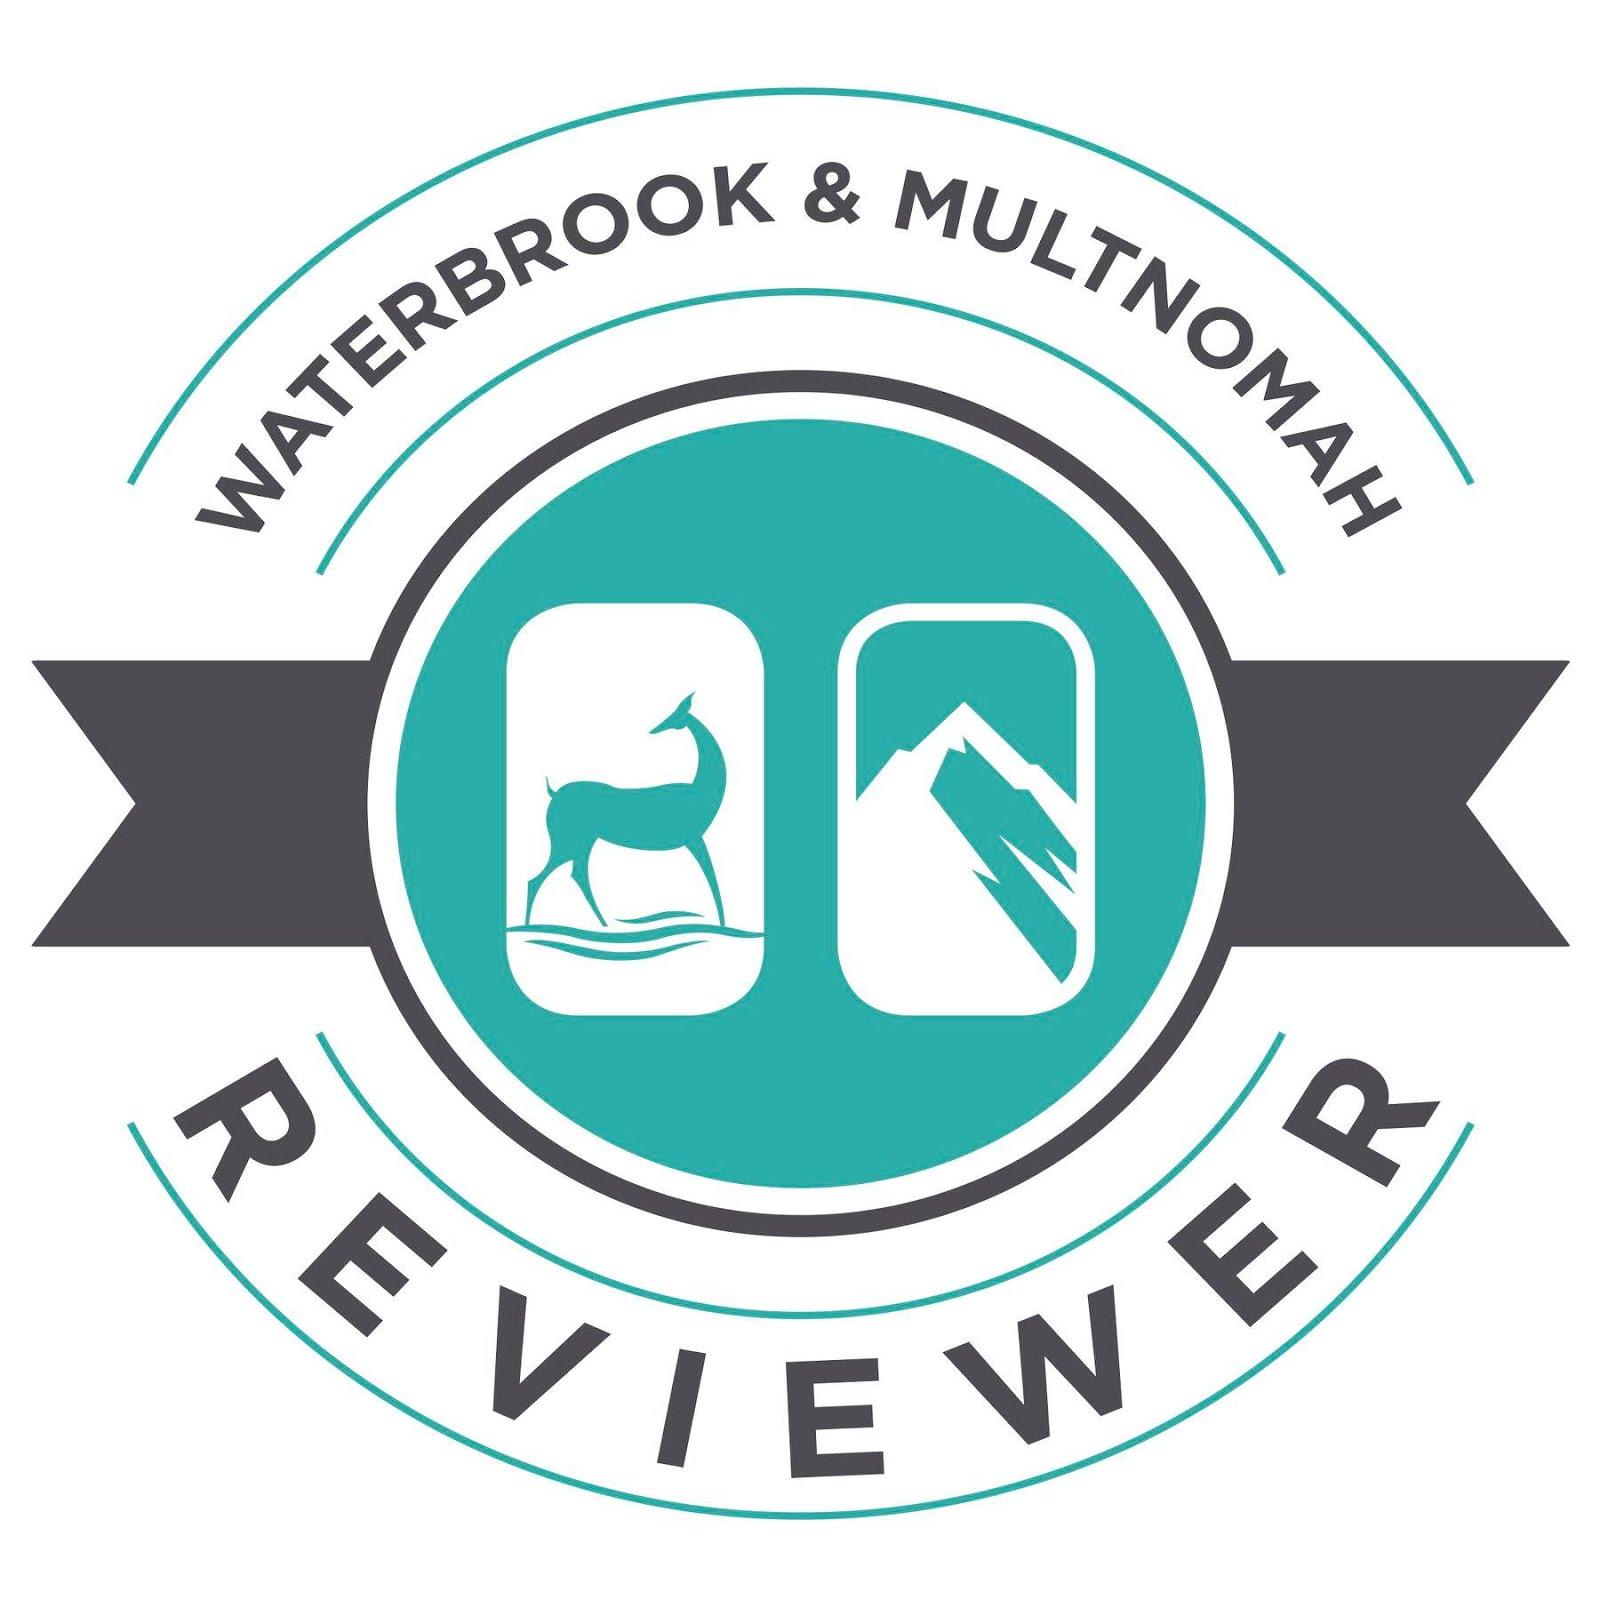 Waterbrook & Multnomah Launch Team